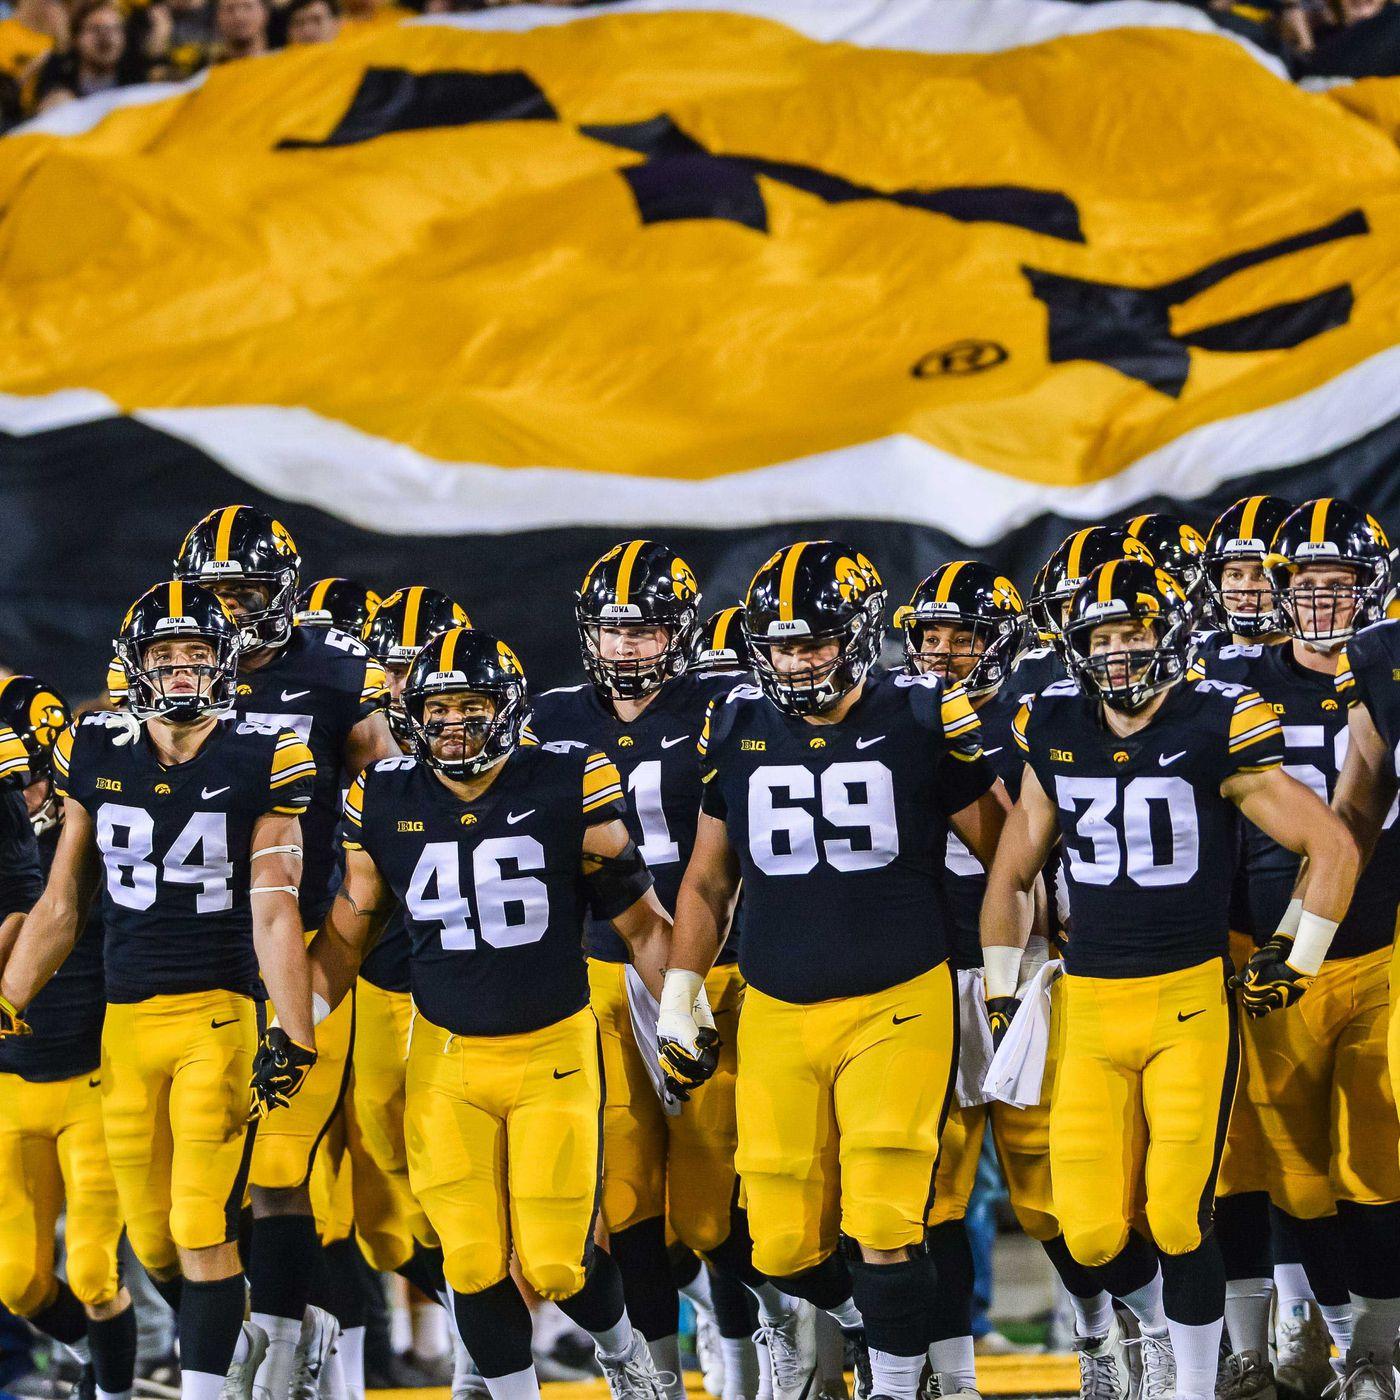 2020 Iowa Football At Purdue Black Heart Gold Pants